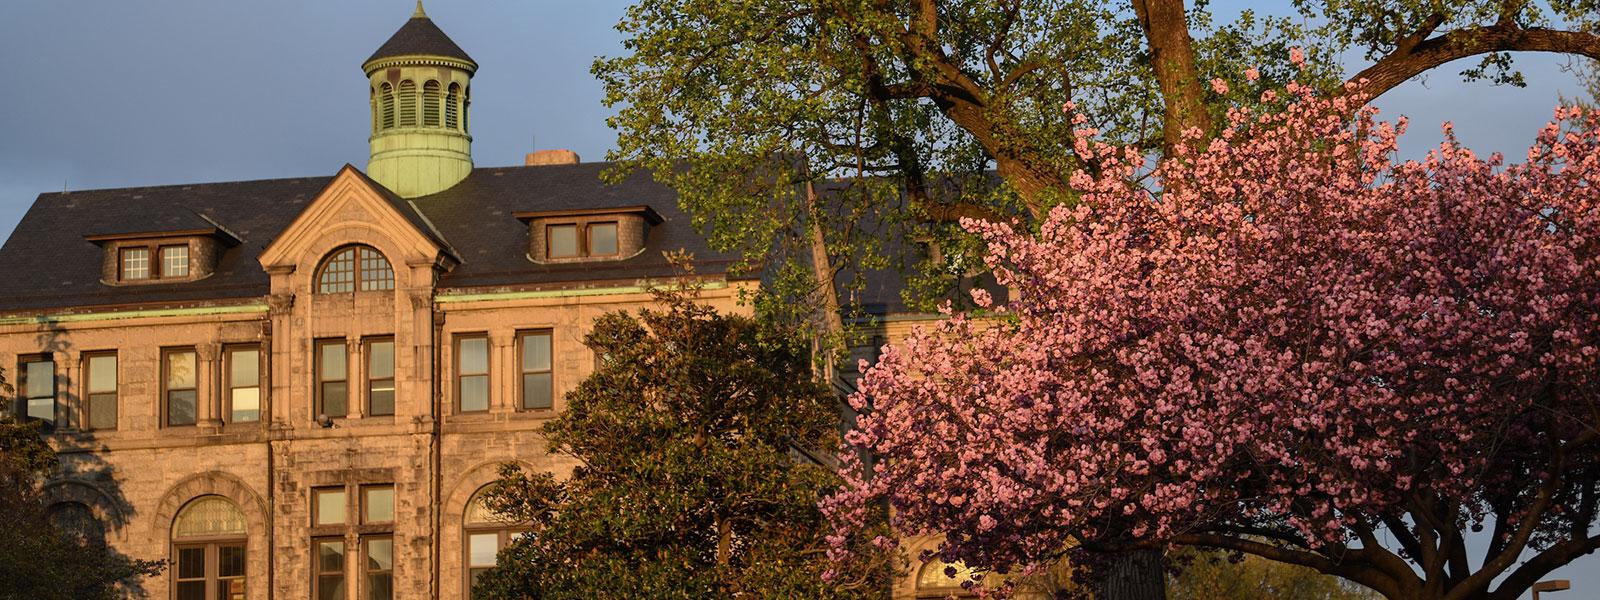 McMahon Hall and cherry blossom tree